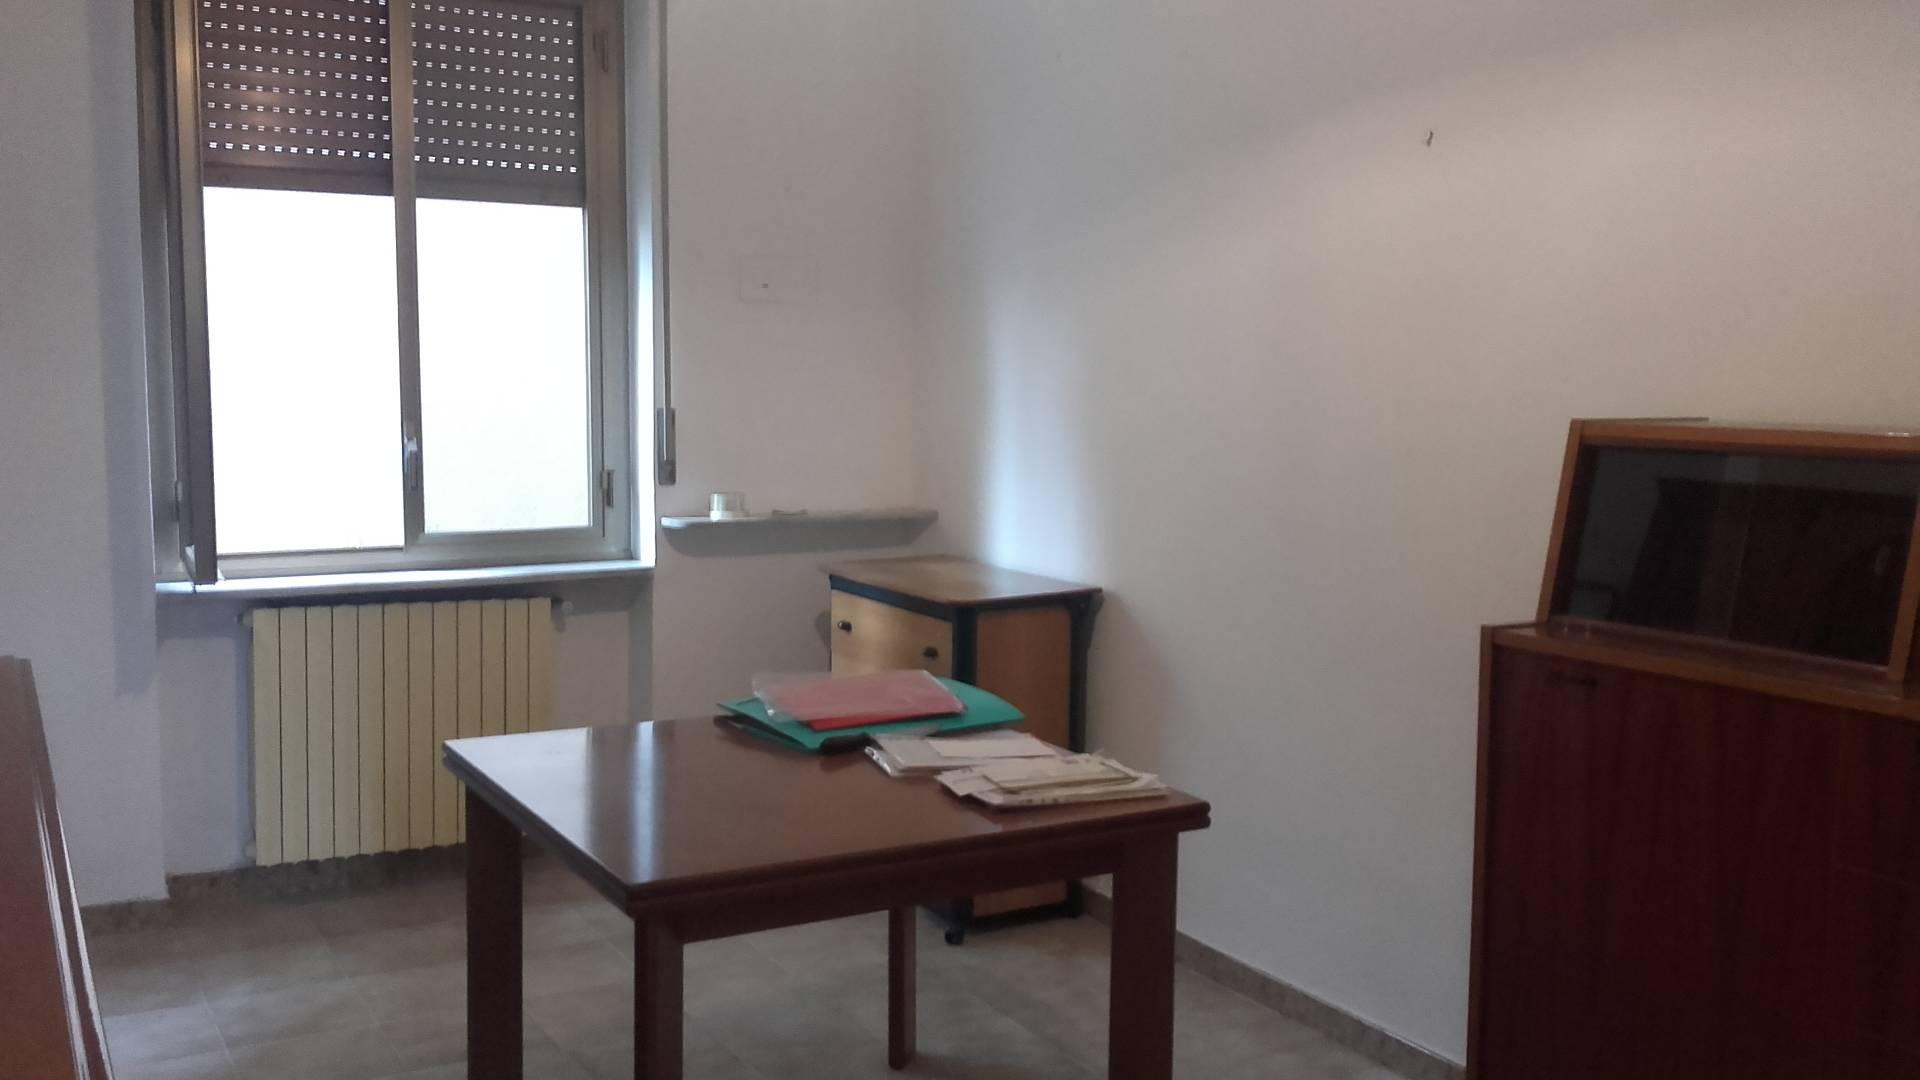 San Giuliano Milanese | Appartamento in Vendita in  | lacasadimilano.it